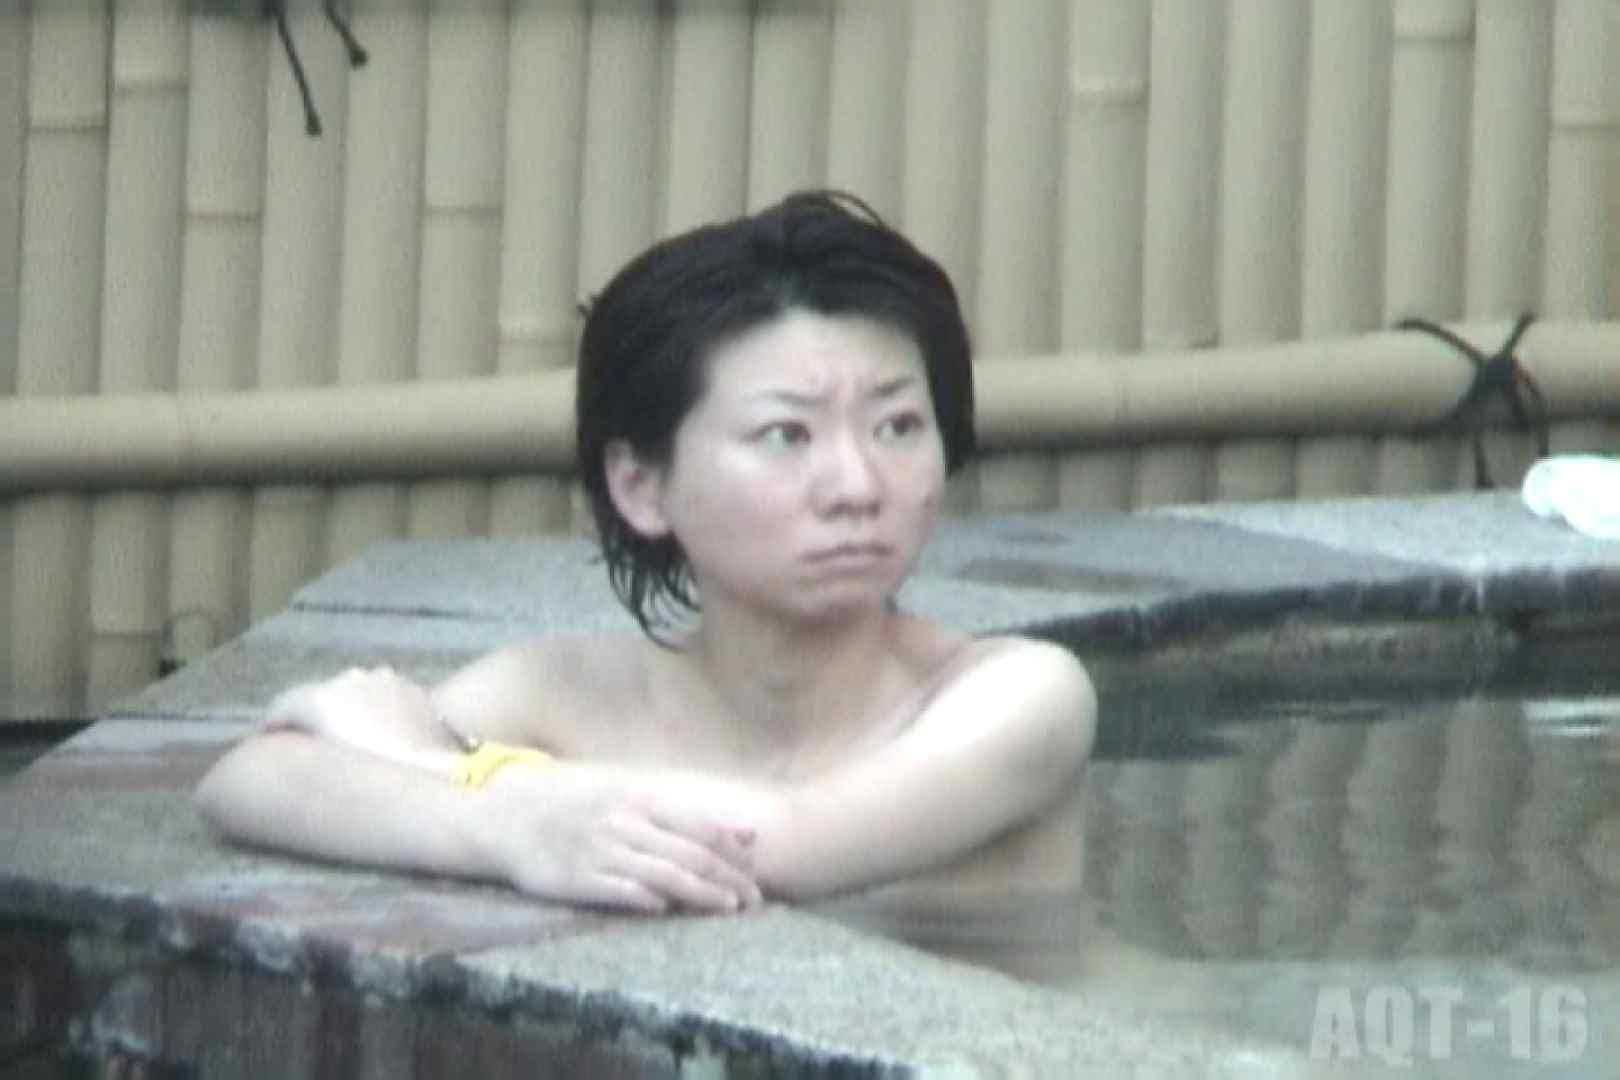 Aquaな露天風呂Vol.842 盗撮  44連発 39